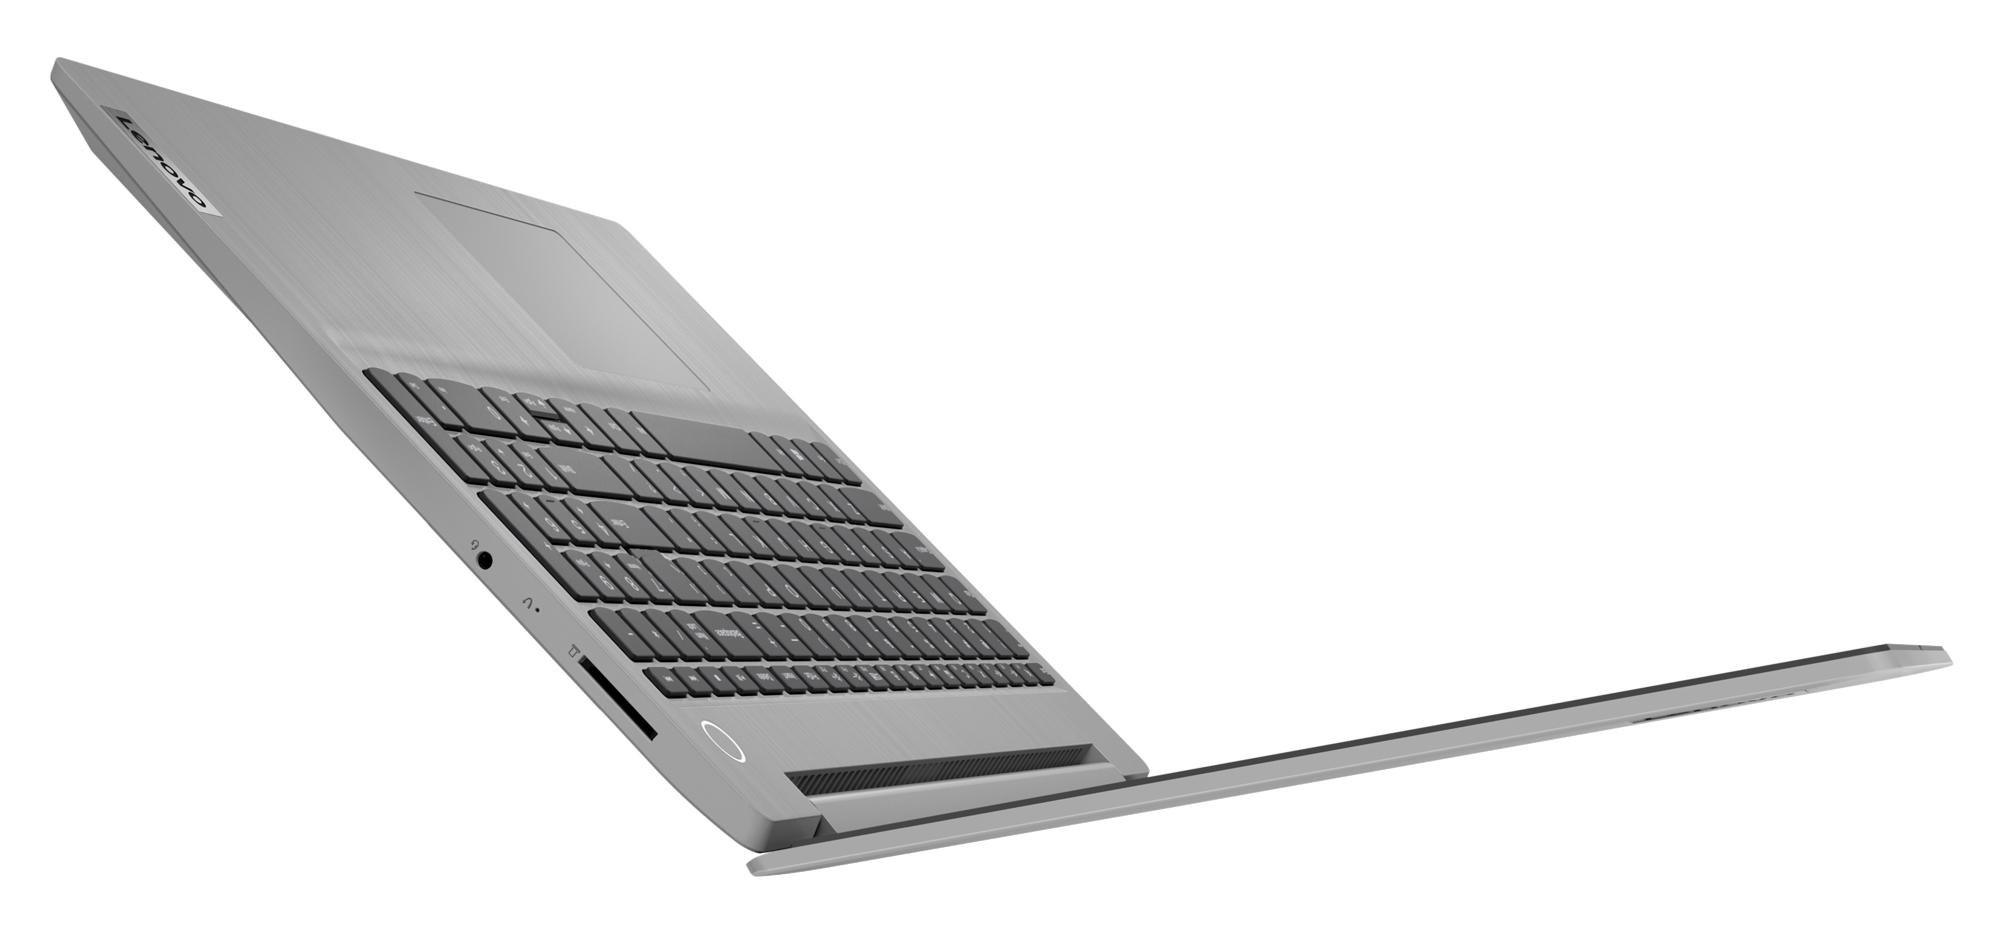 Фото  Ноутбук Lenovo ideapad 3 15ADA05 Platinum Grey (81W100APRE)